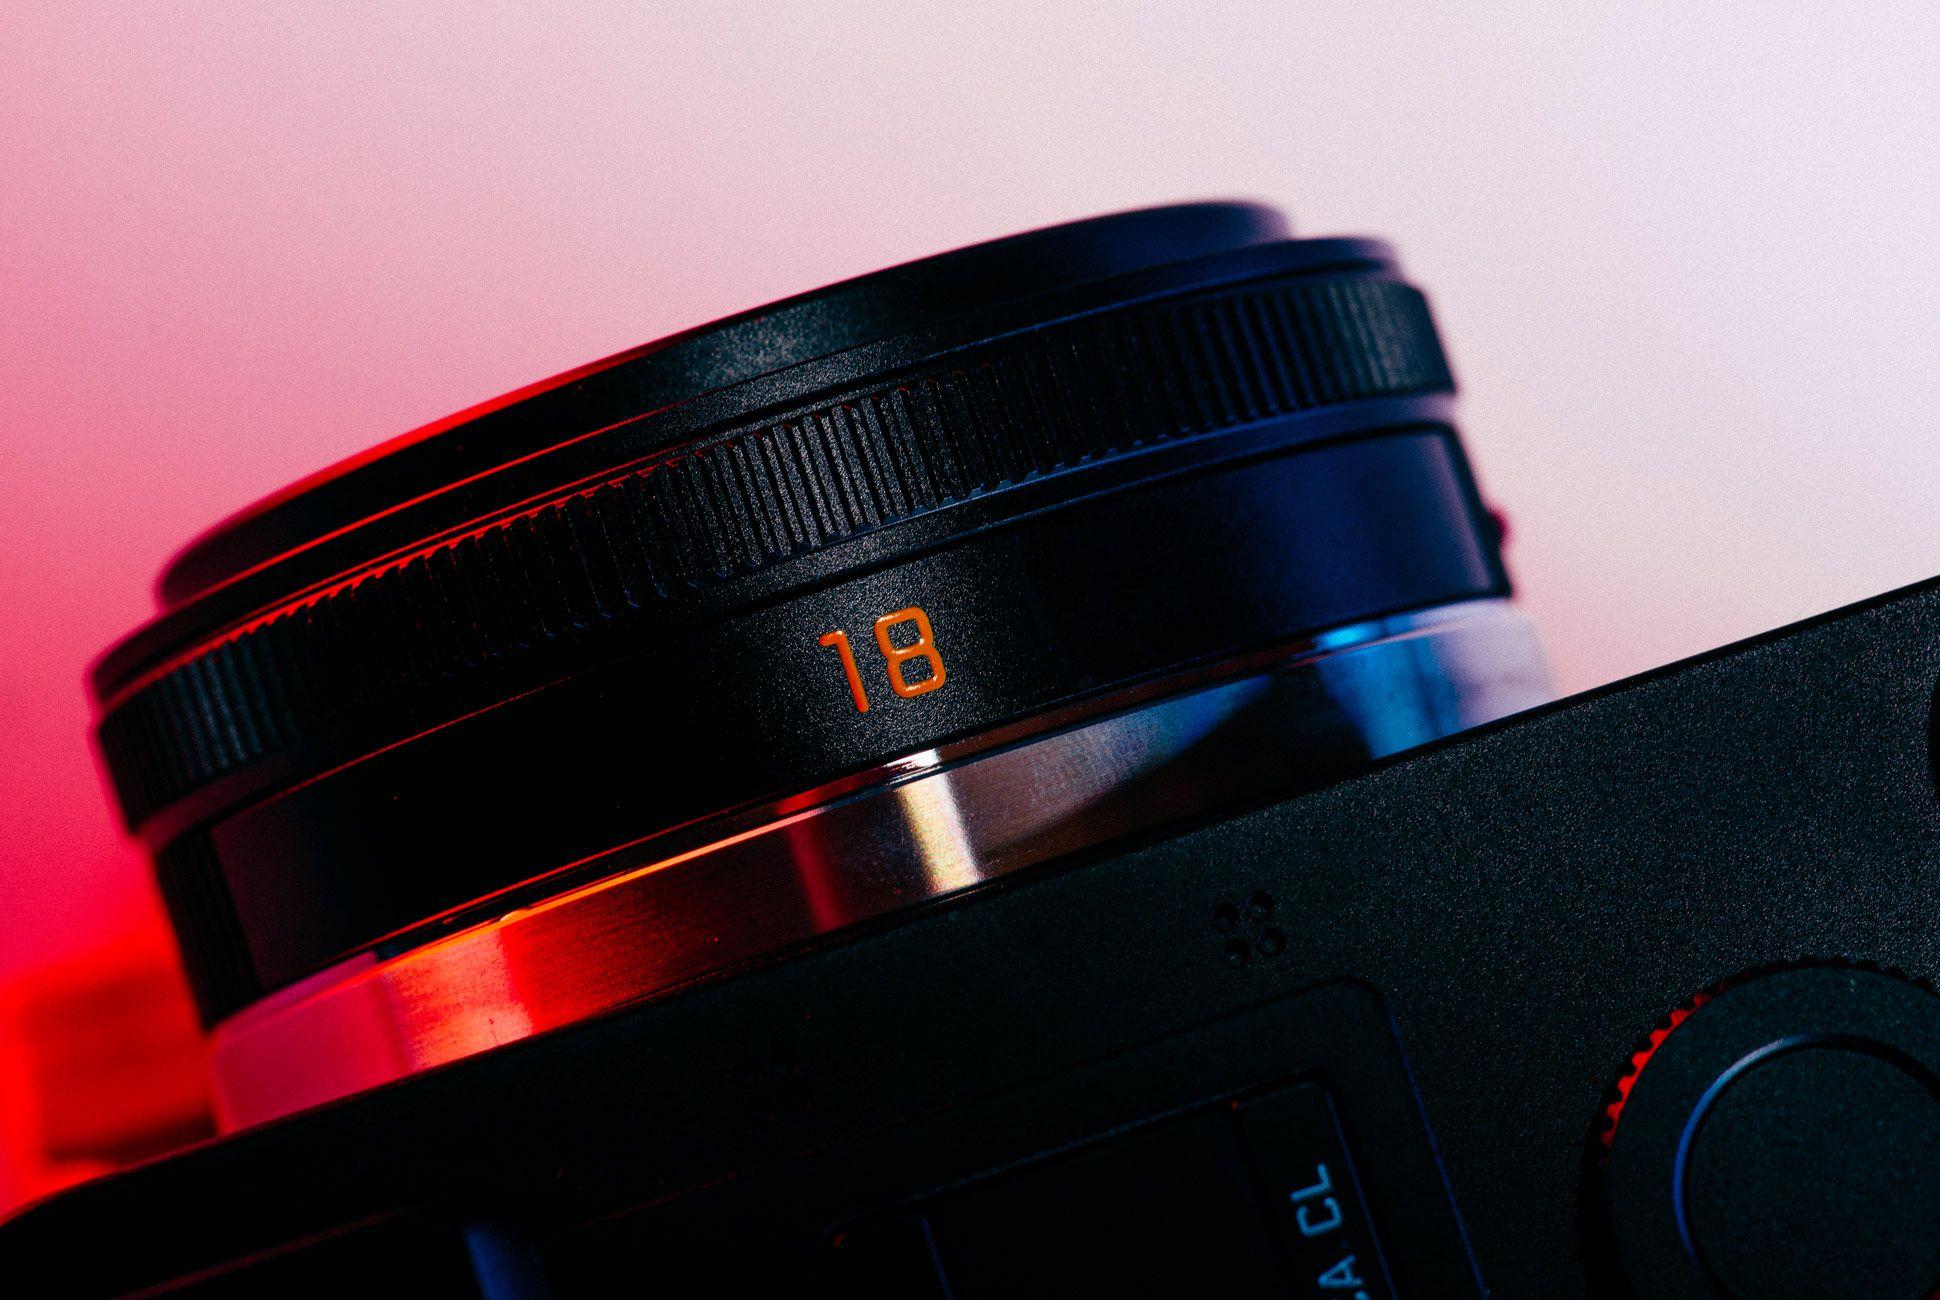 Leica-CL-Gear-Patrol-Slide-5